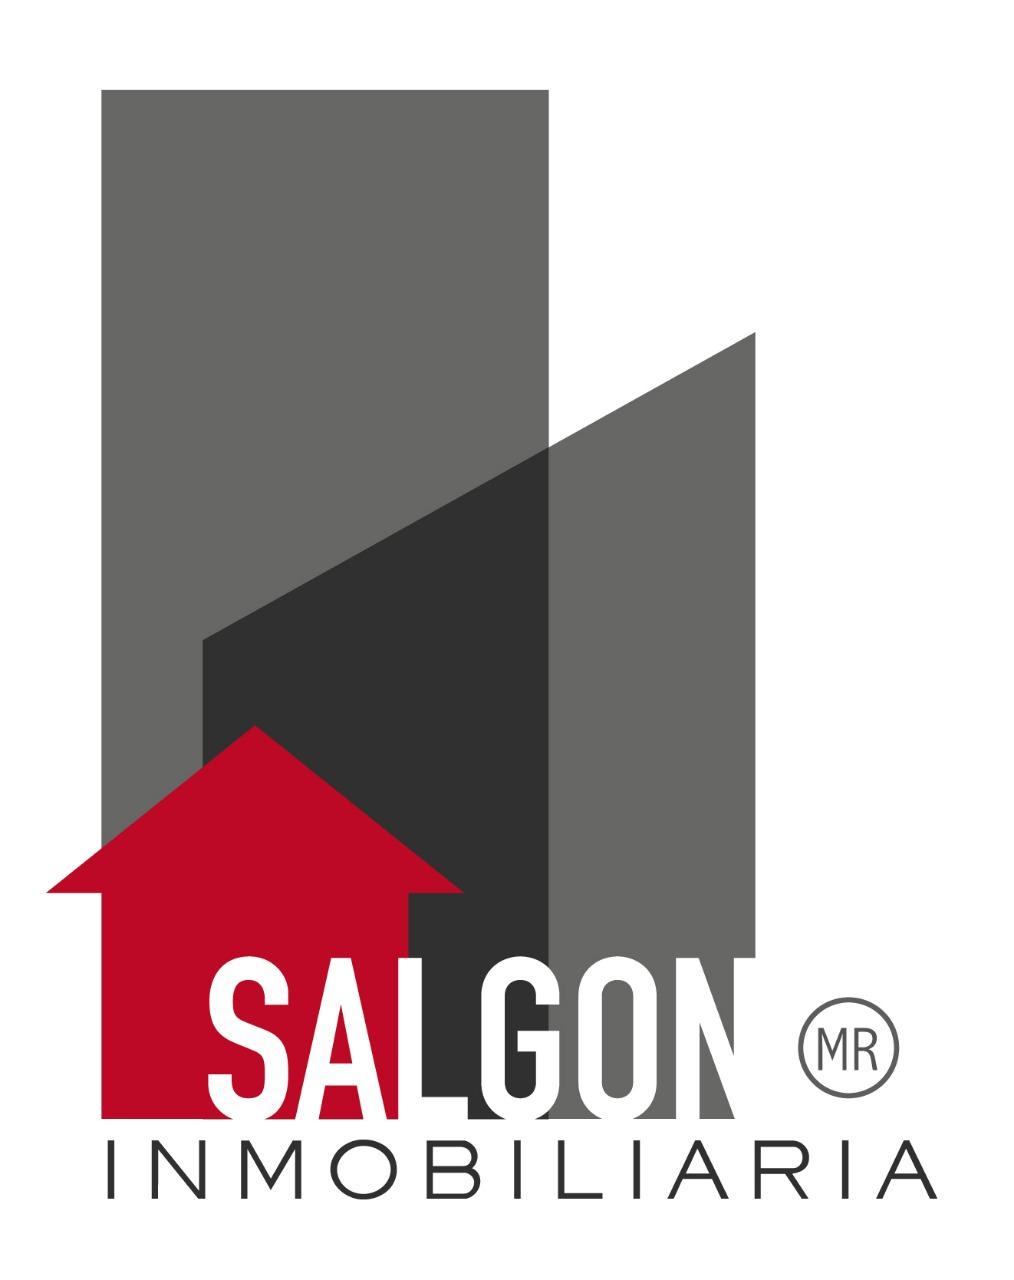 Inmobiliaria Salgon